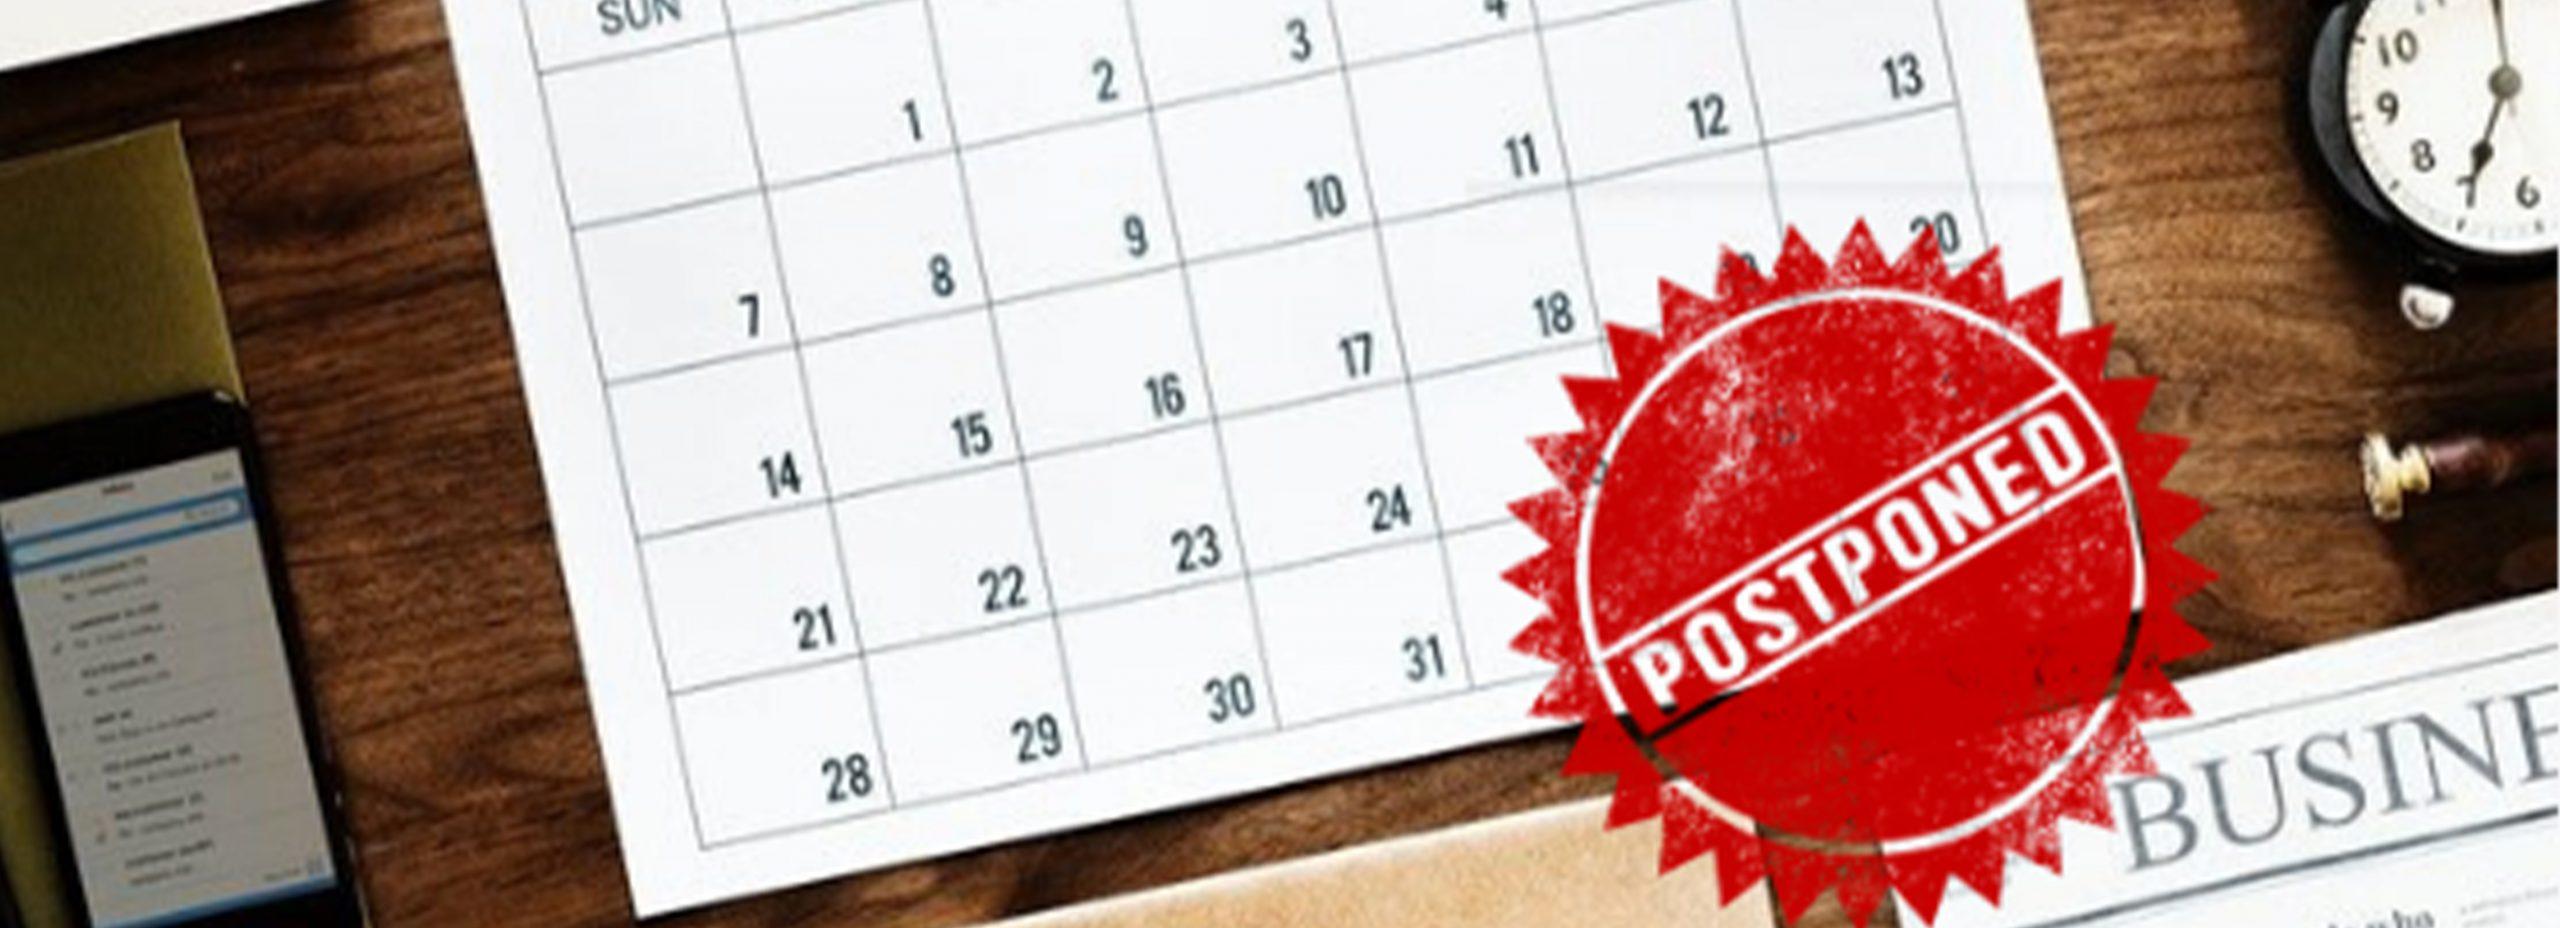 Bando INAIL 2019 – Click Day 2020 Sospeso